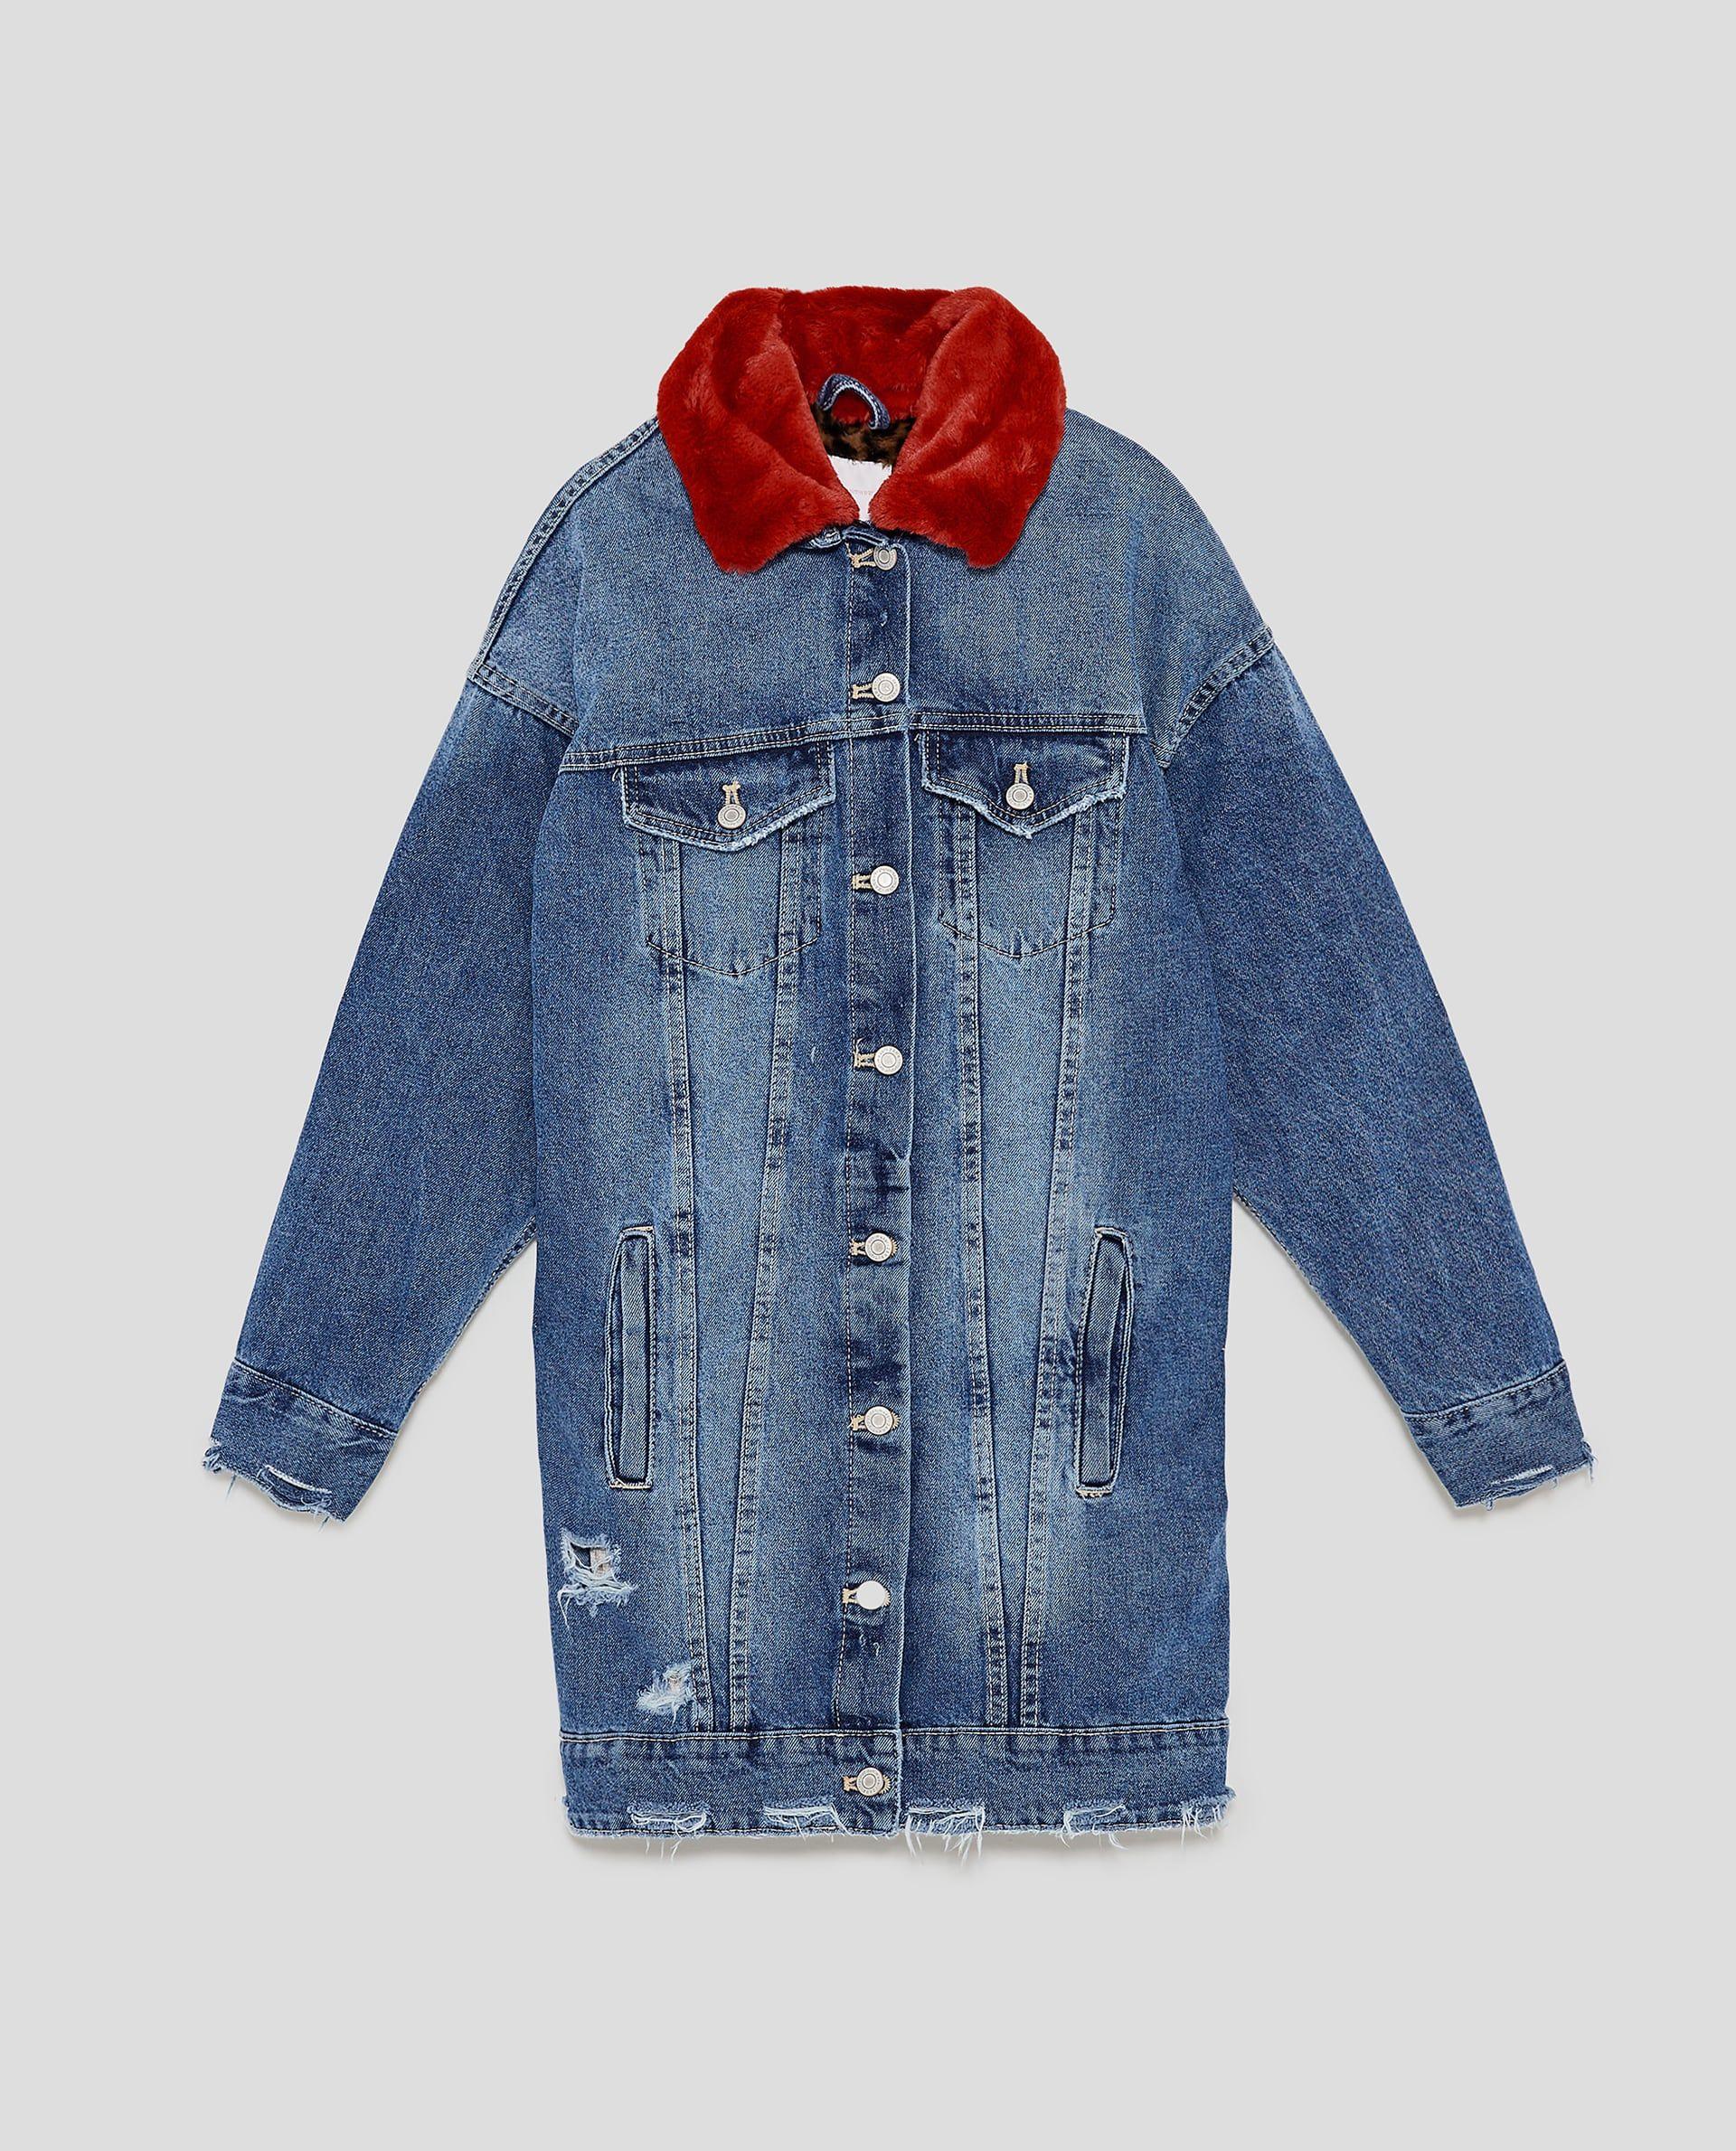 Image 8 Of Long Denim Jacket With Faux Fur Collar From Zara Long Denim Jacket Jackets Denim Jacket [ 2379 x 1920 Pixel ]